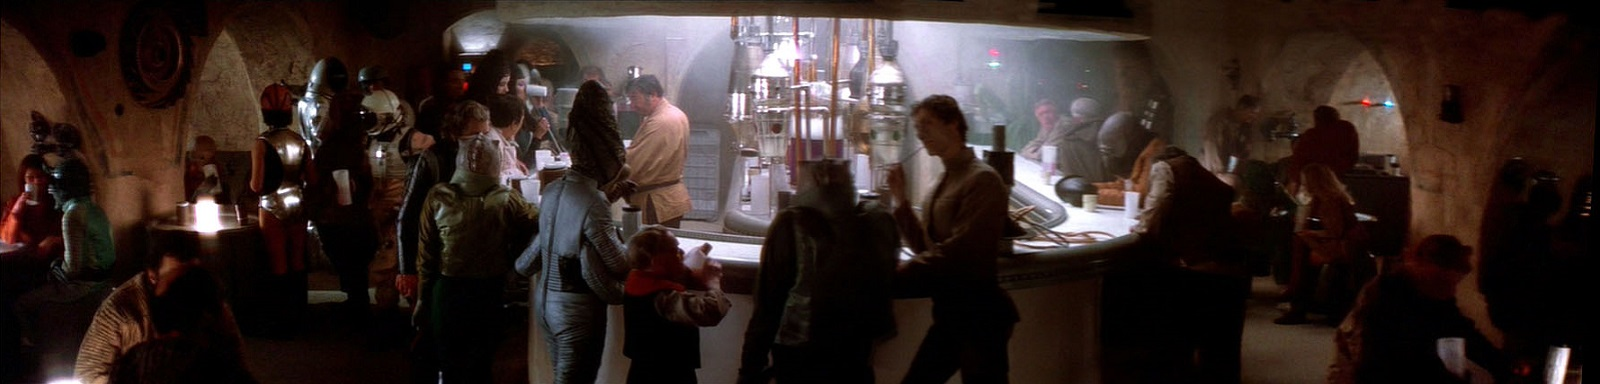 Star Wars Alien Bar Scene